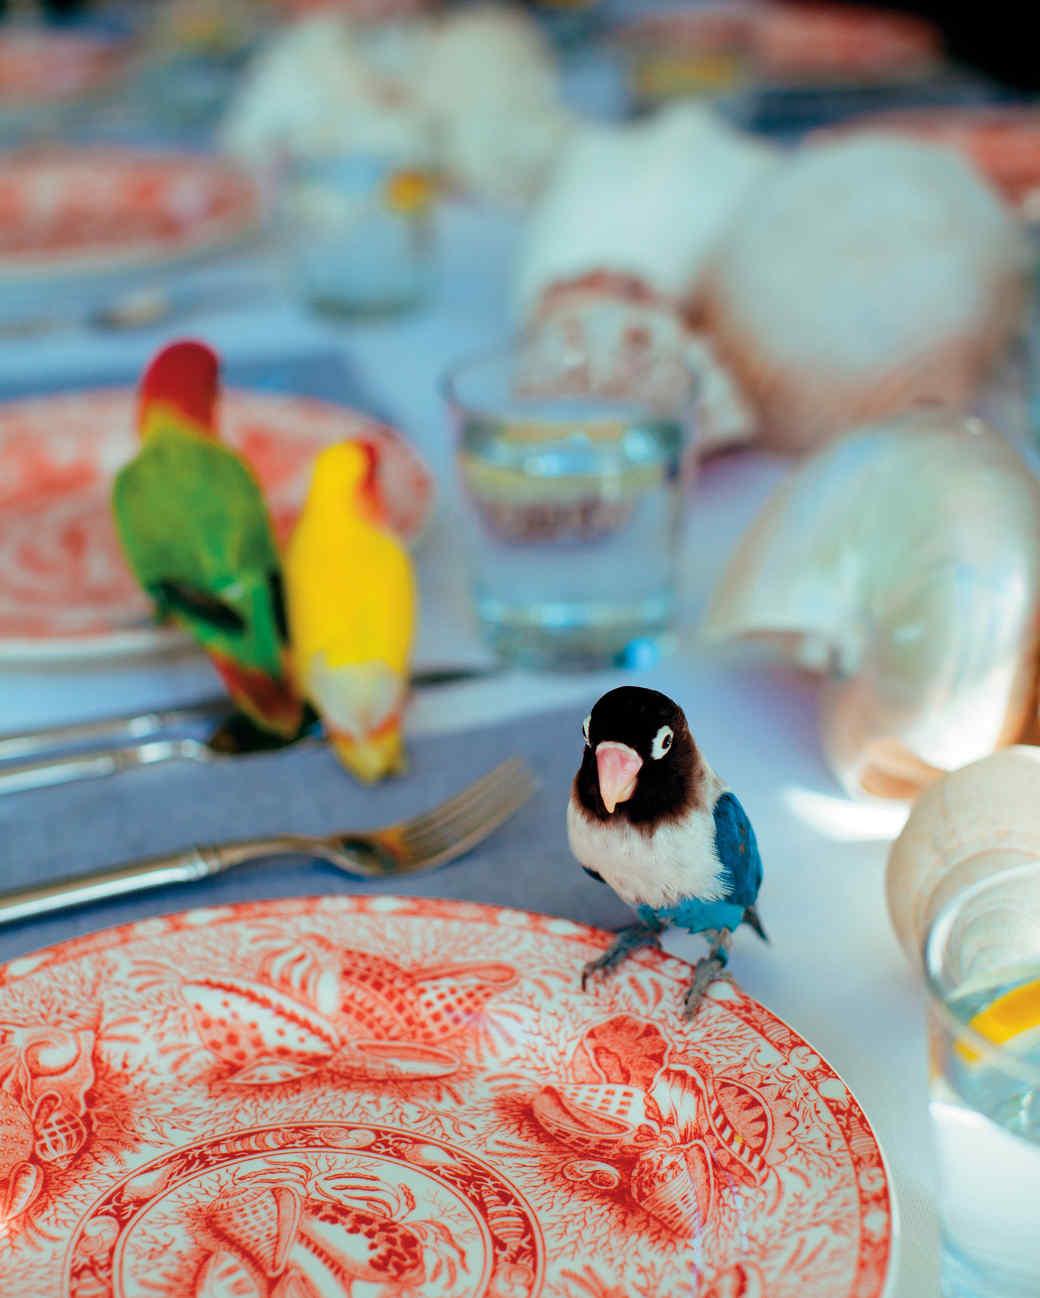 bird-place-setting.jpg